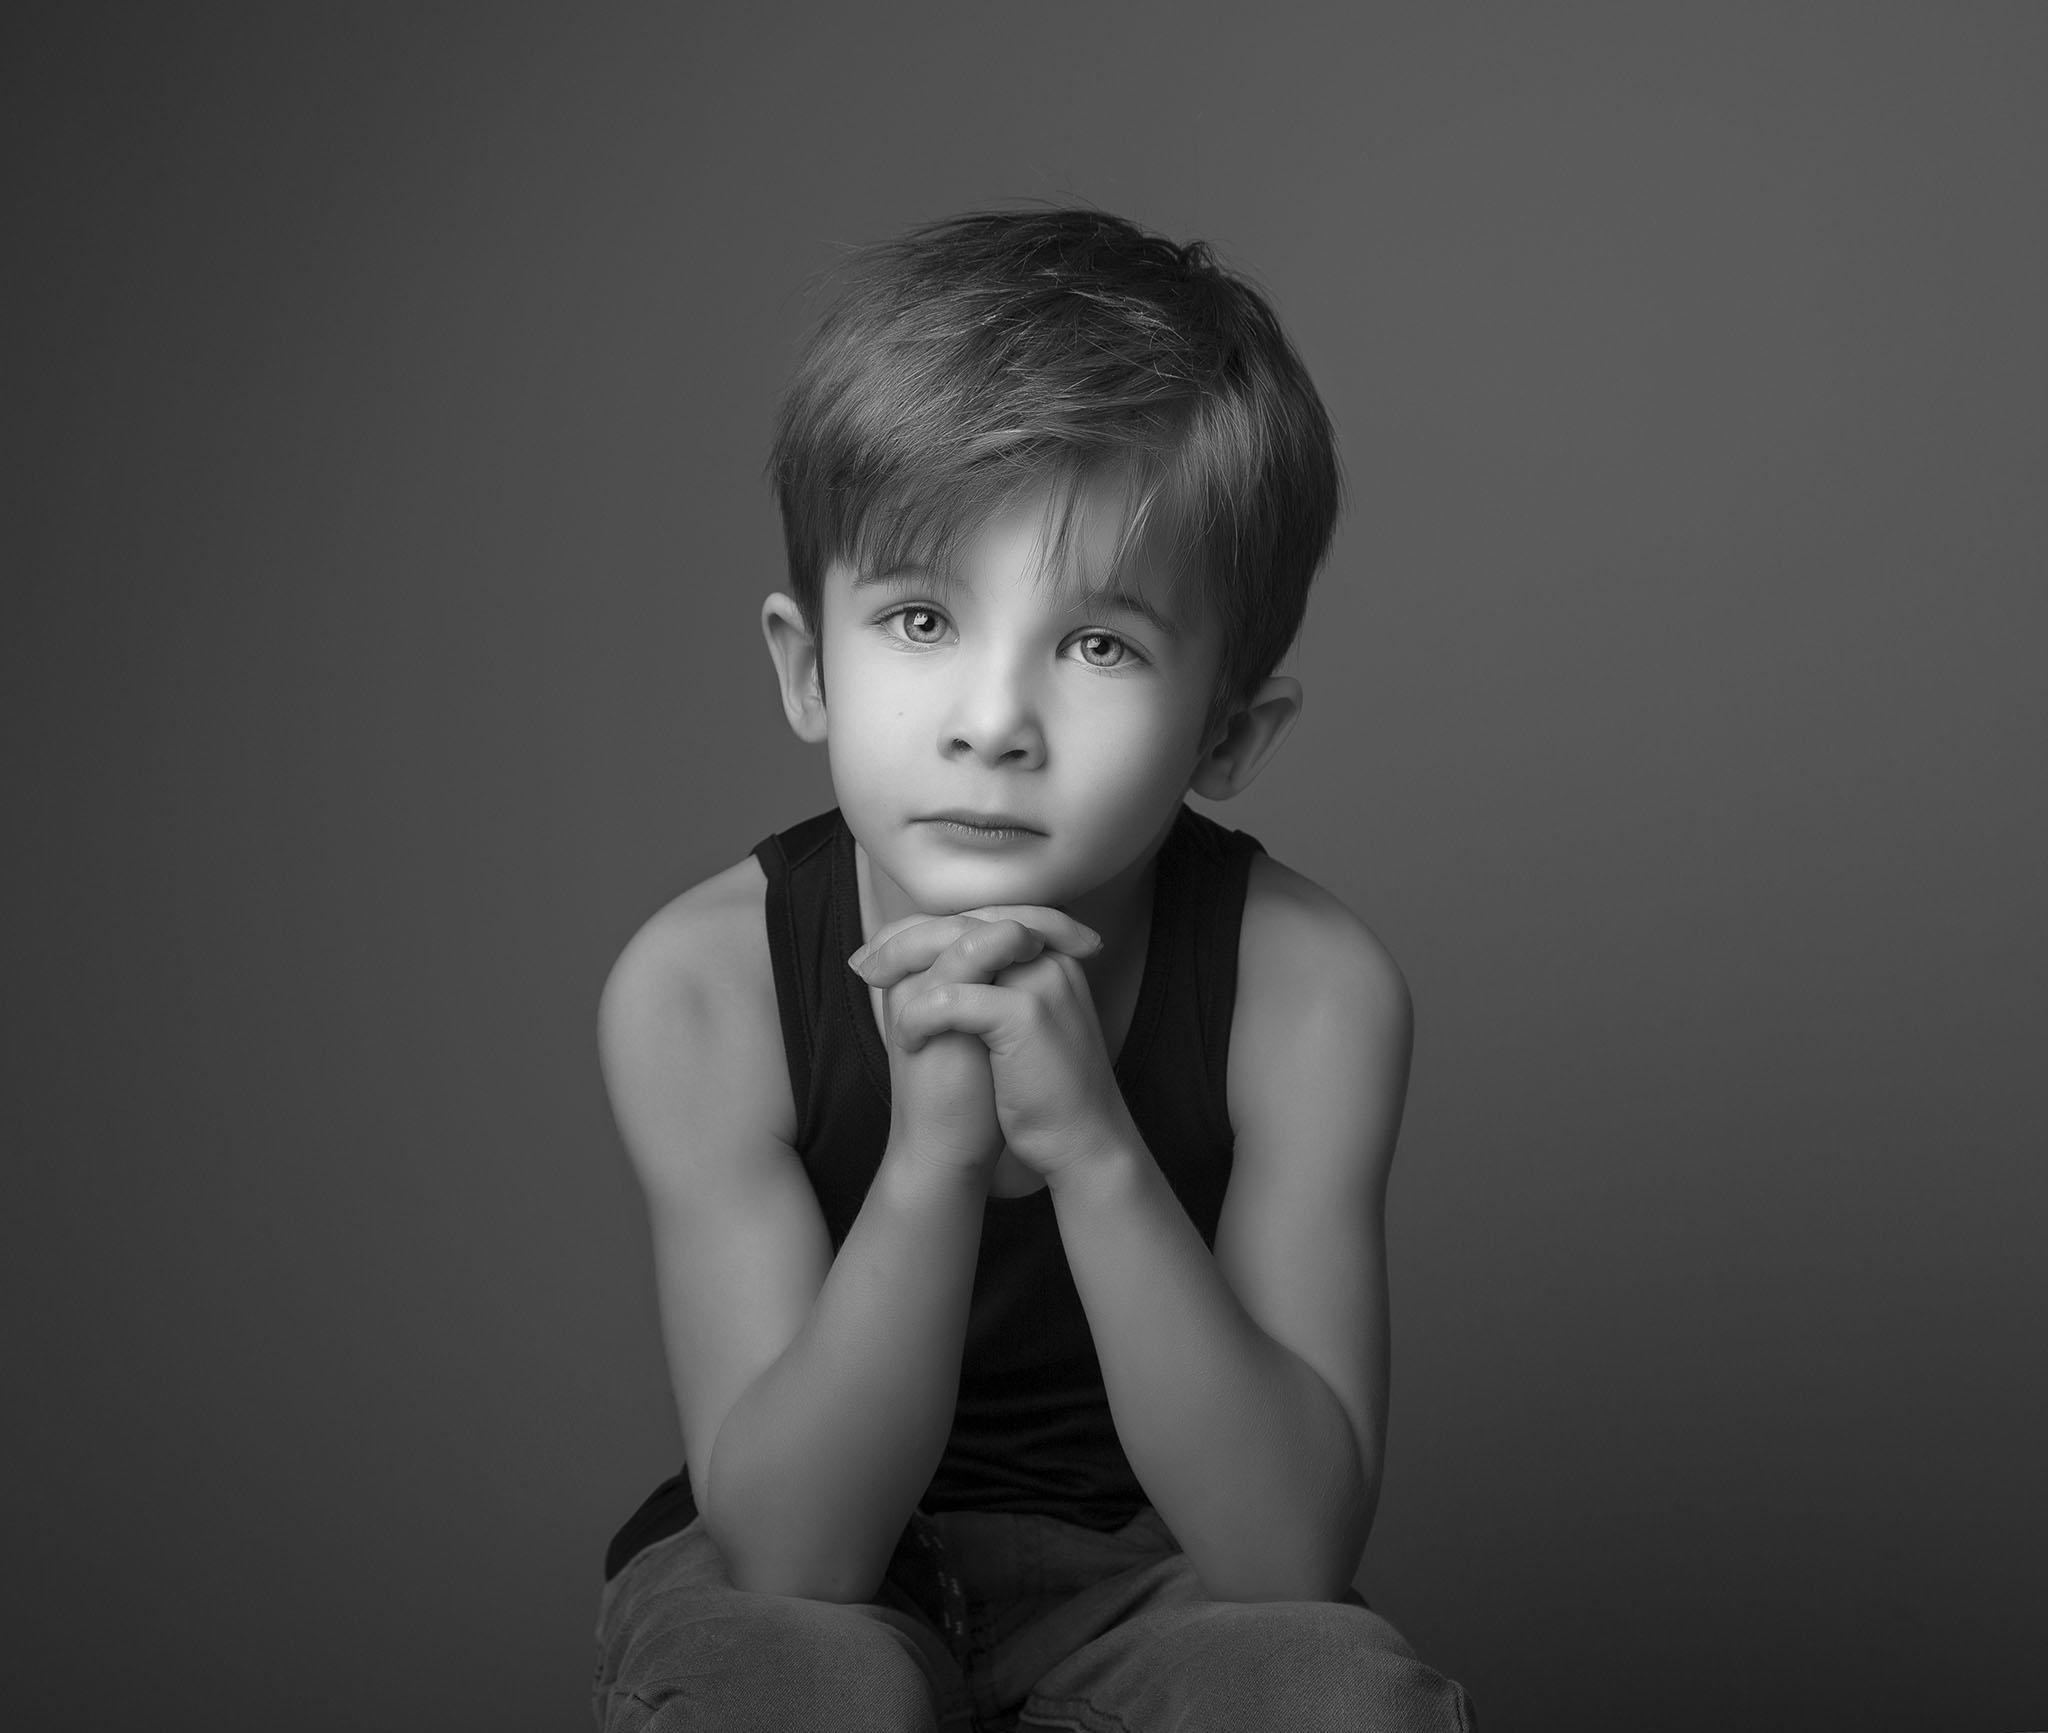 elizabethgphotography_kingslangley_hertfordshire_fineart_childrens_photography_84.jpg